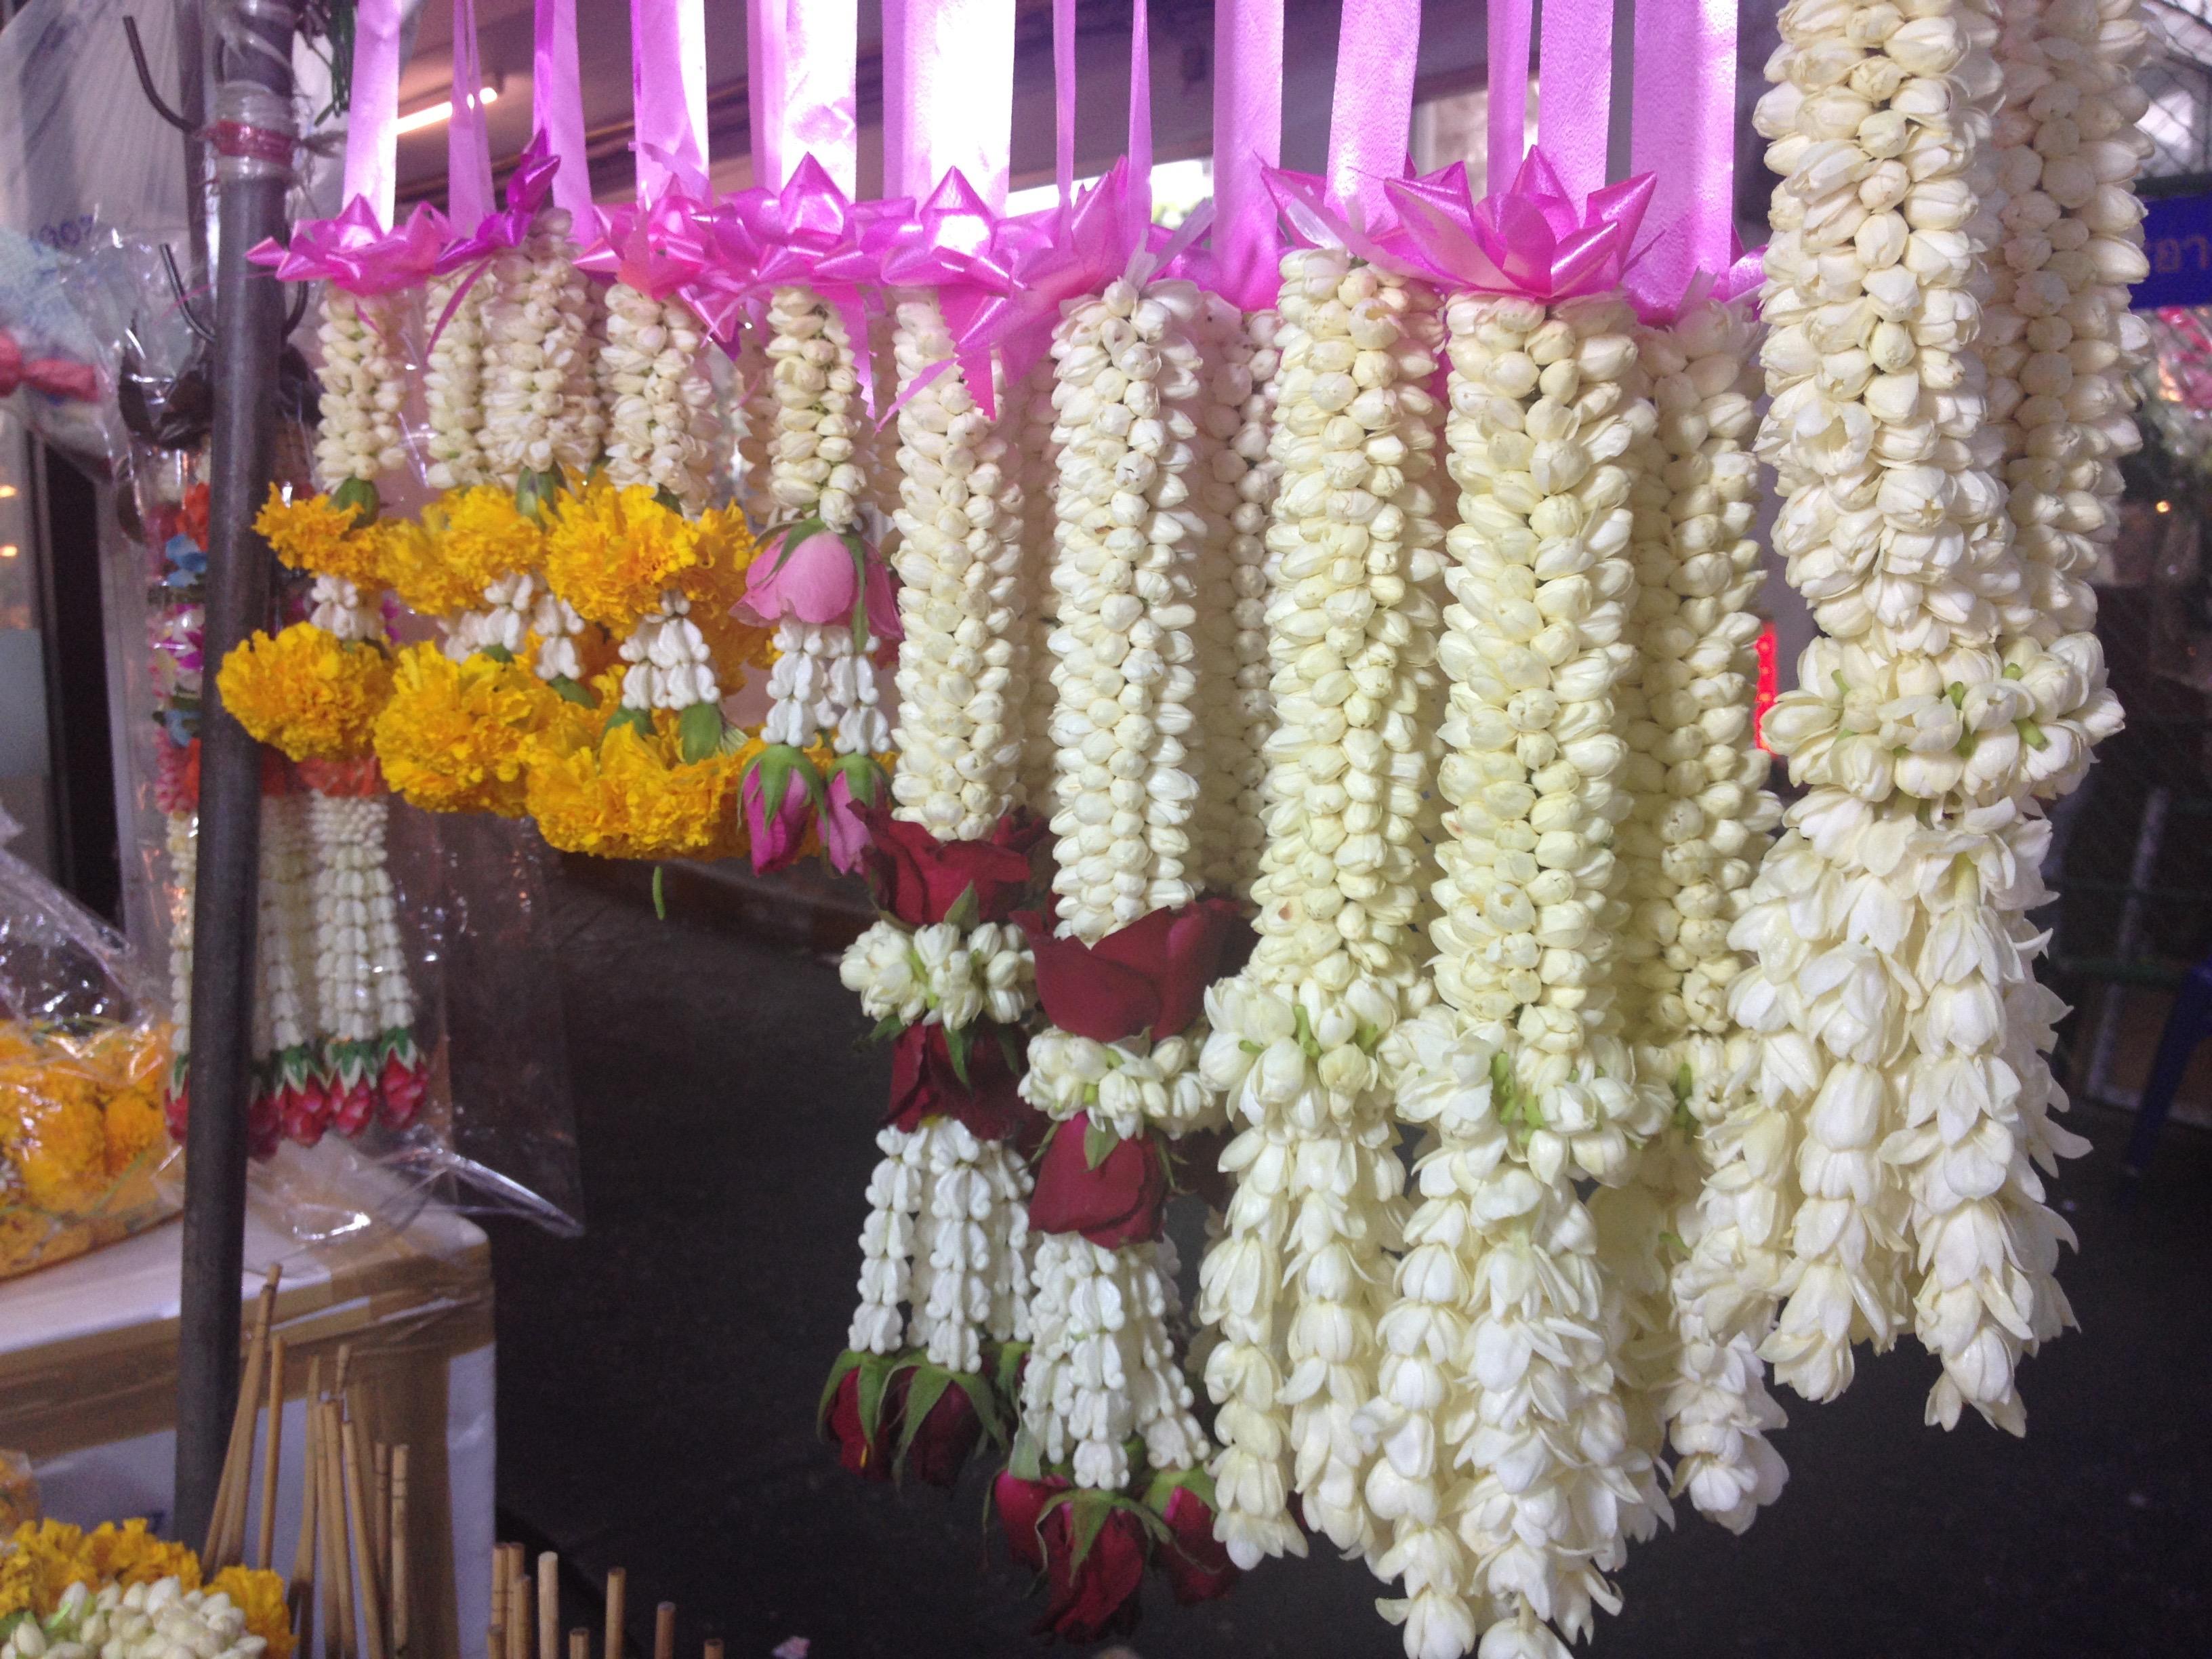 Phuang malai, coroncine di fiori intrecciate a mano.